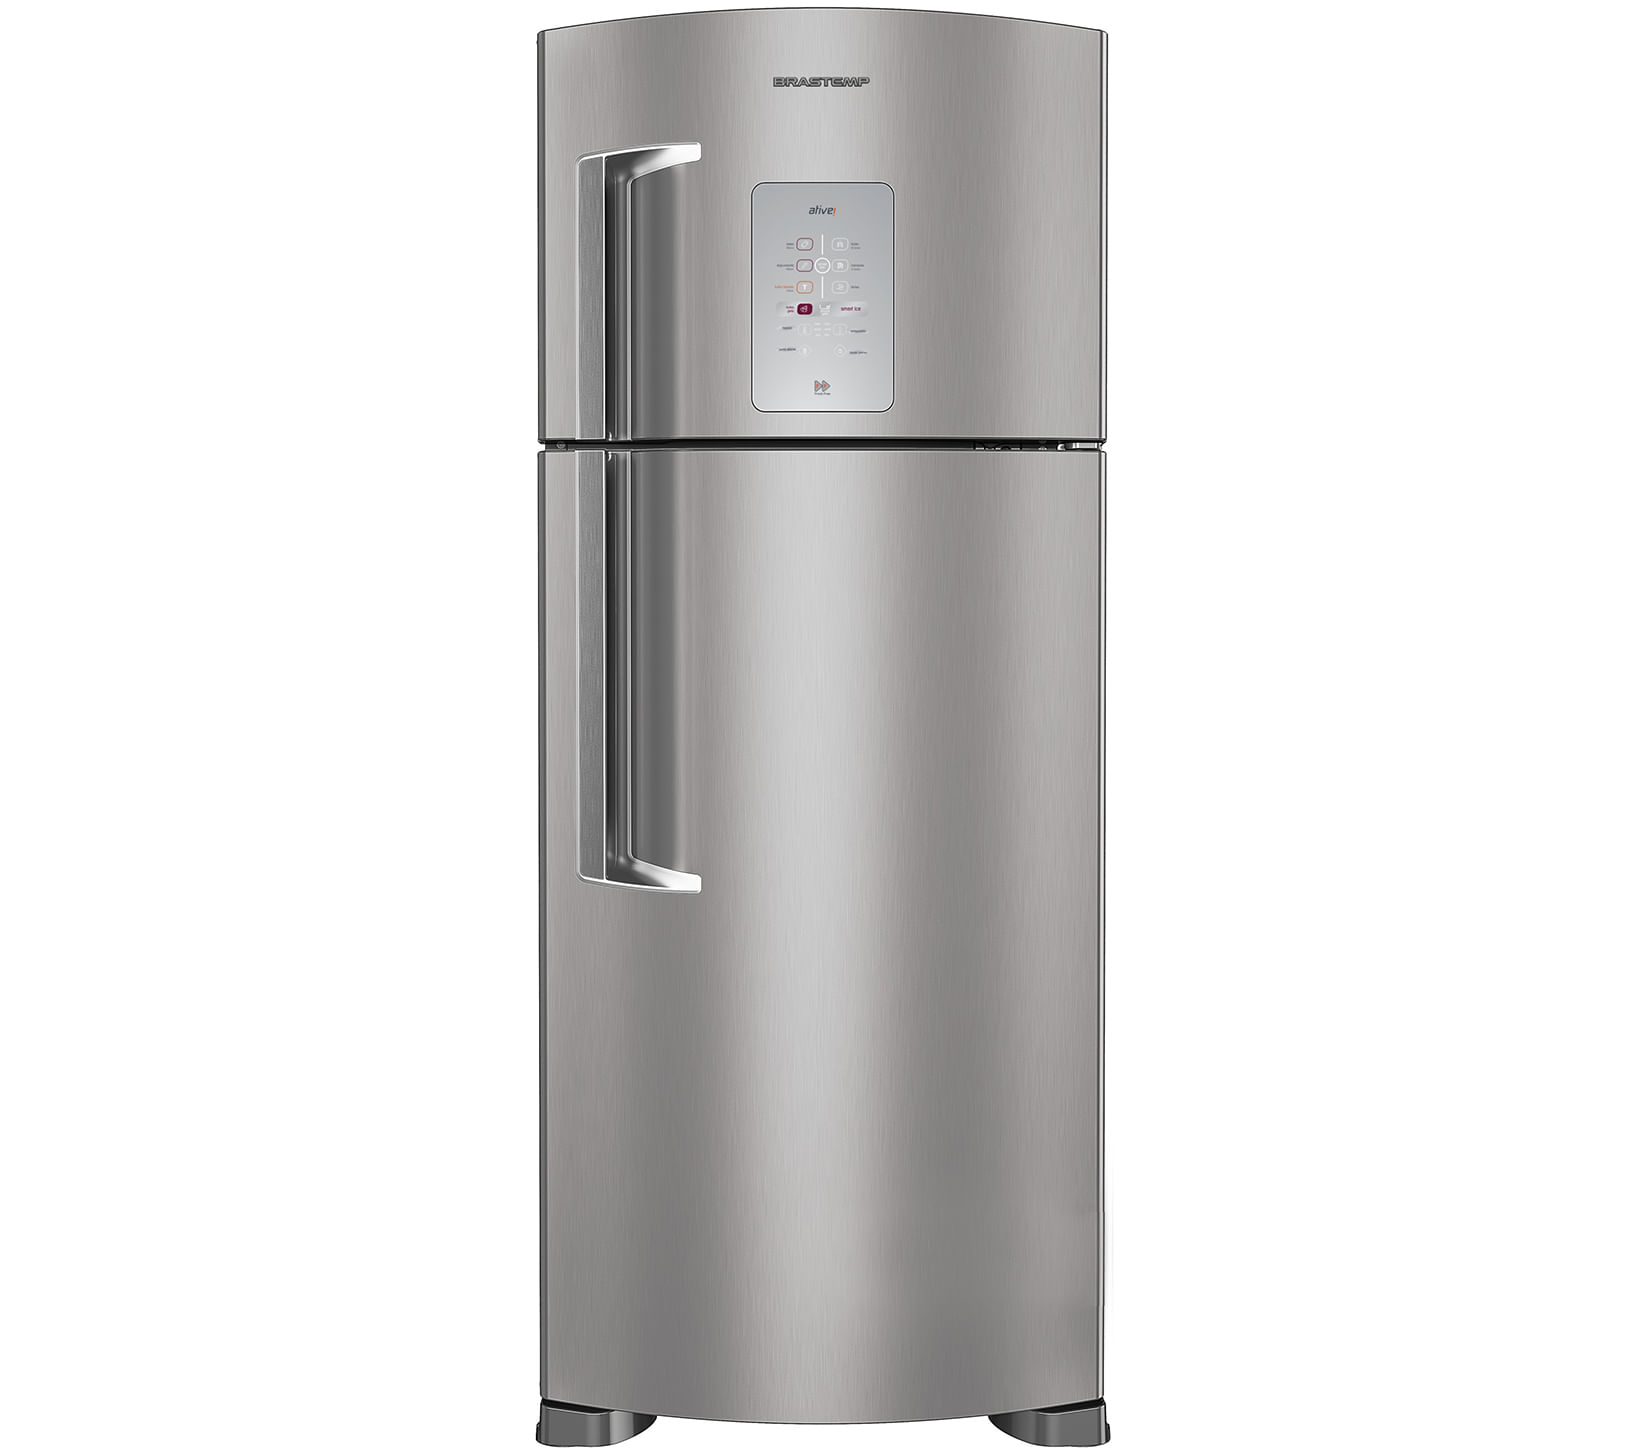 Geladeira Brastemp Frost Free Duplex 403 litros cor Inox com Smart Bar